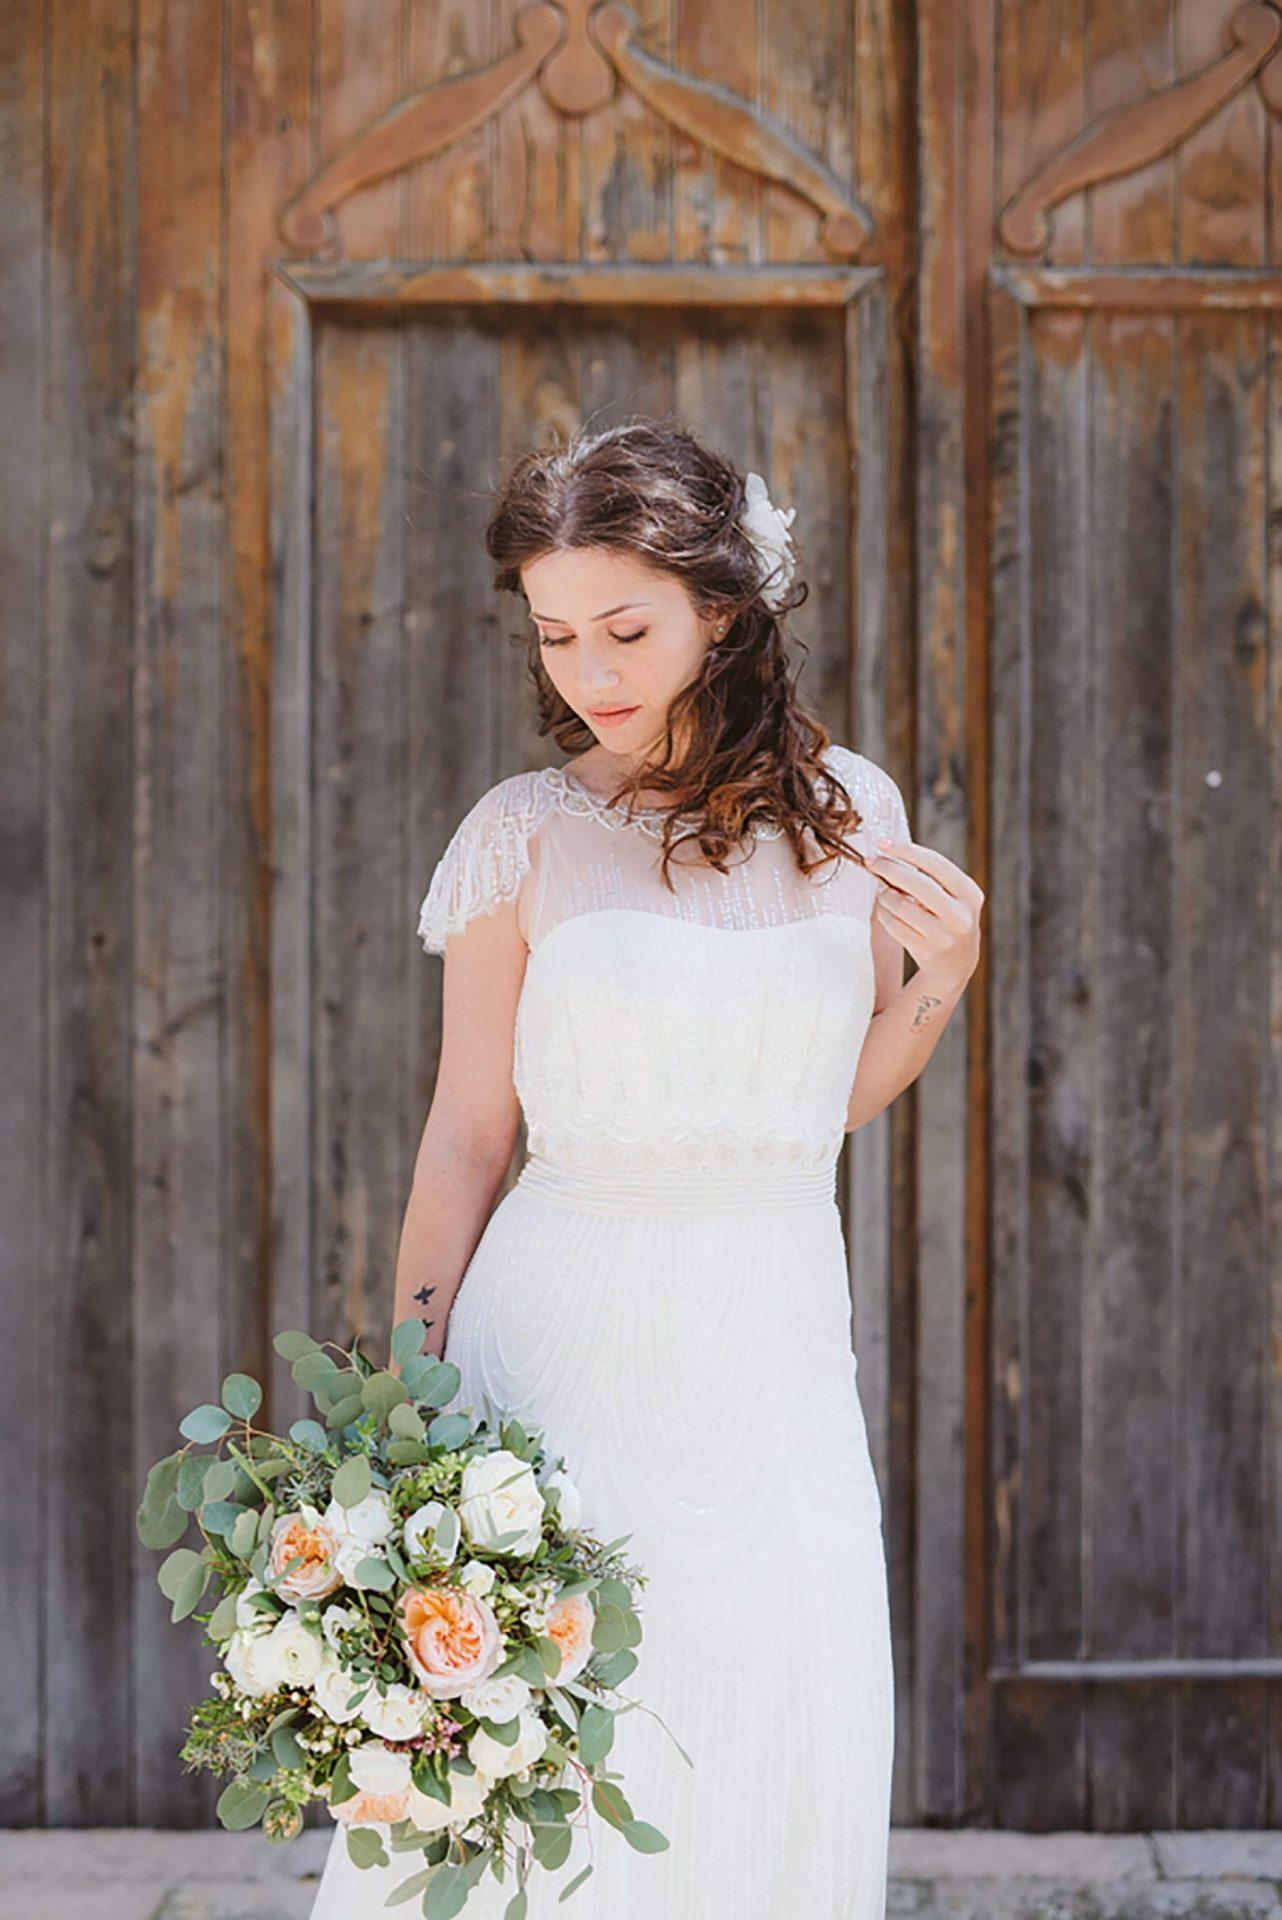 Elopement in ancient Italian village, the bride